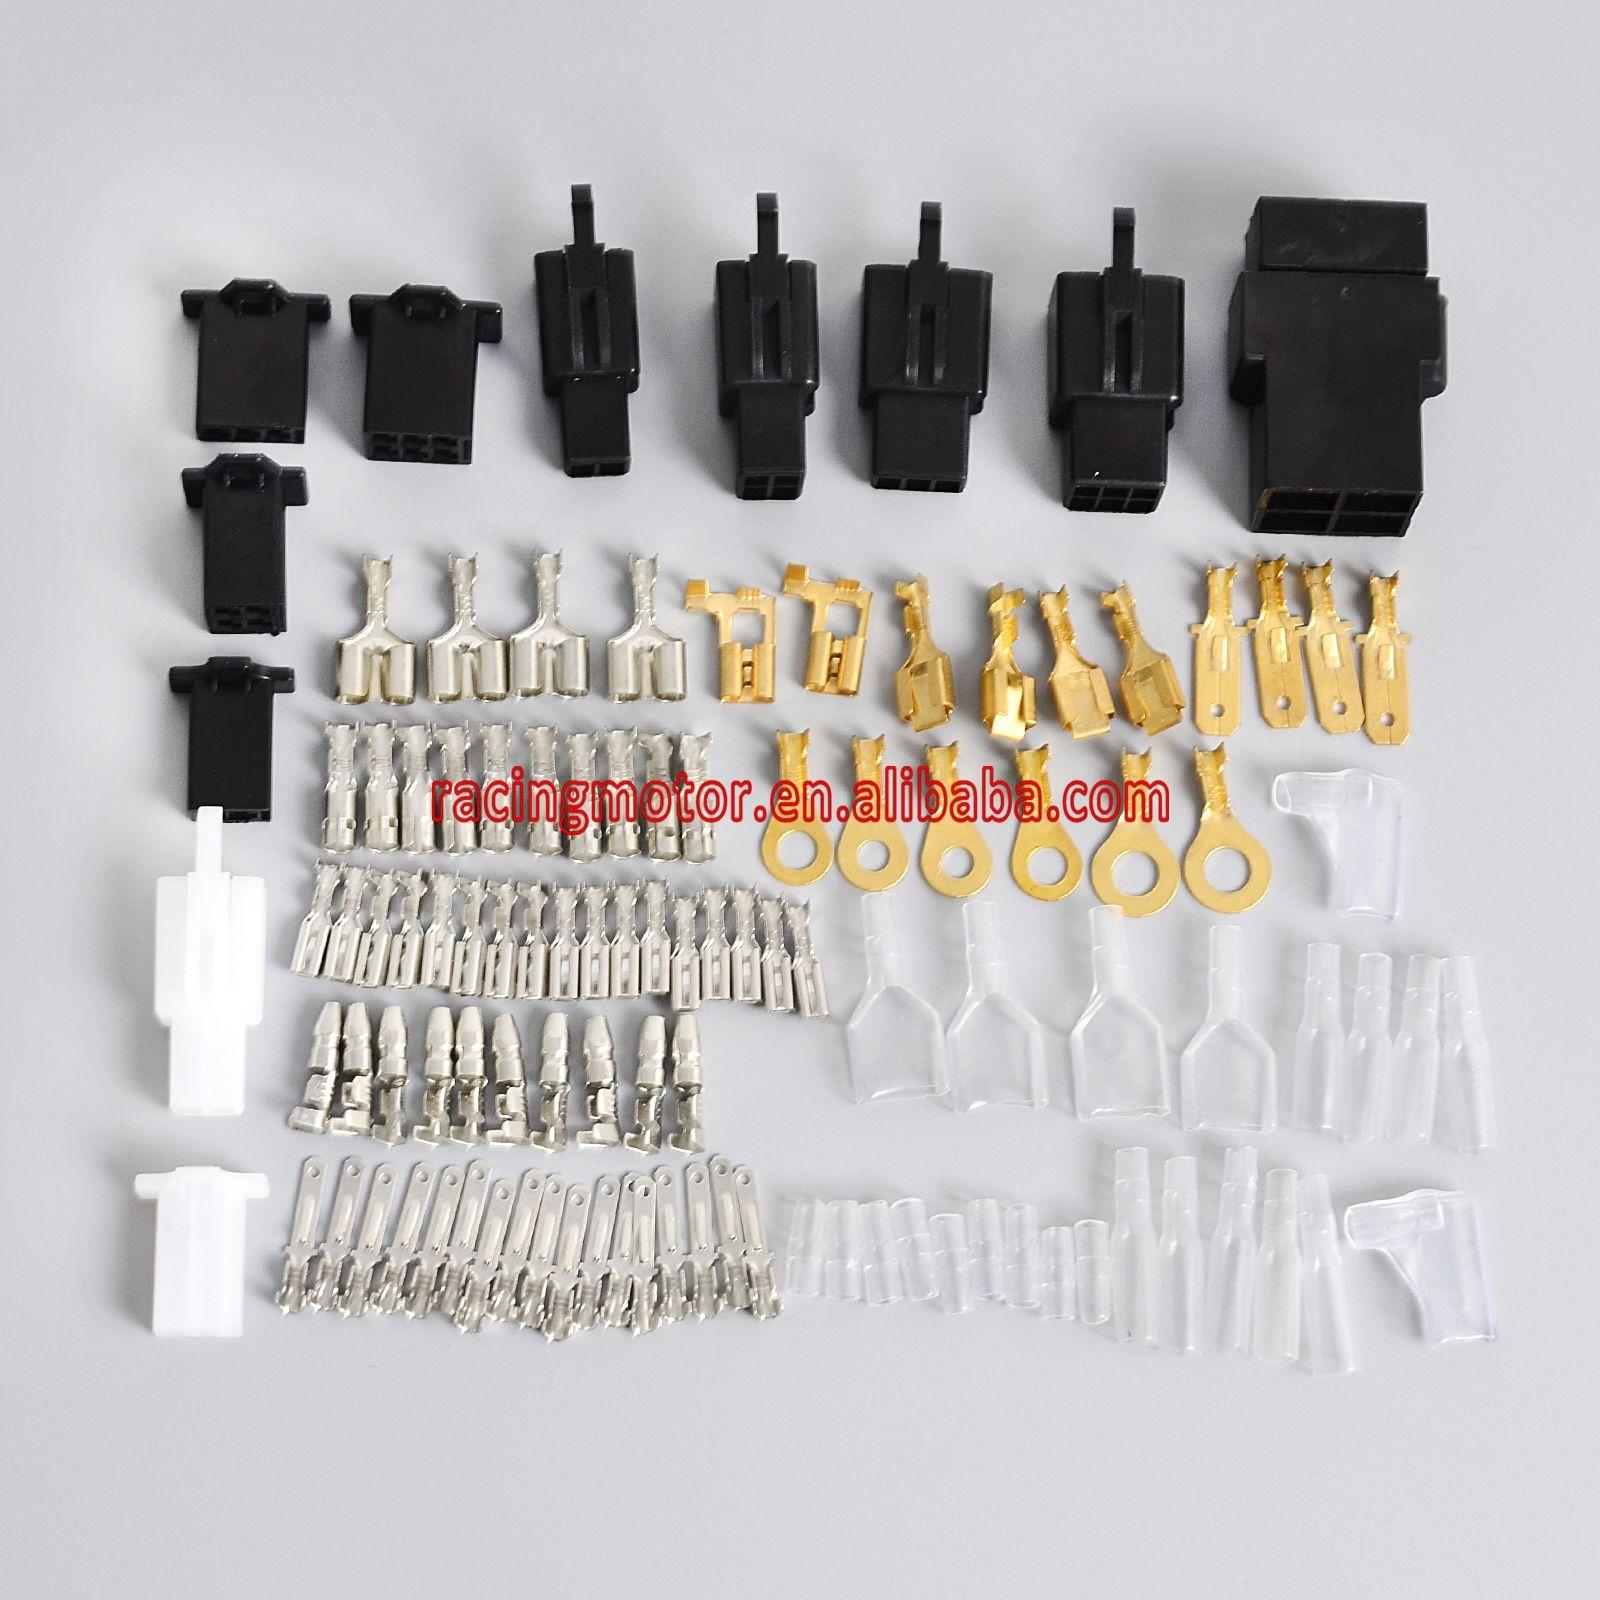 For Honda Motorcycle Electrical Wiring Harness Loom Repair Kit Plugs Tool Bullets Connectors